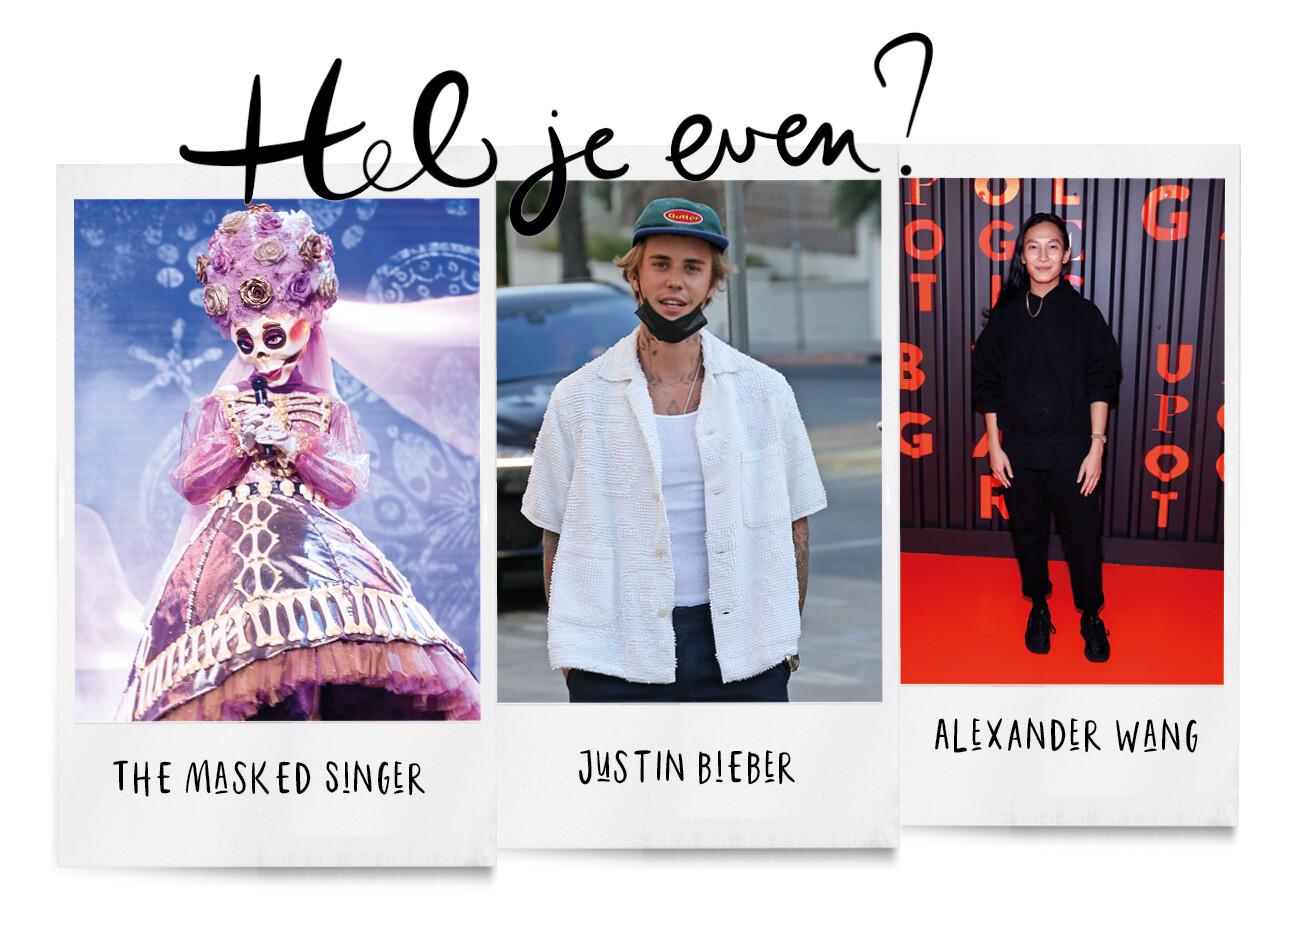 hb-koffiezetpraatjes-justinbieber-Alexander Wang-themaskedsinger